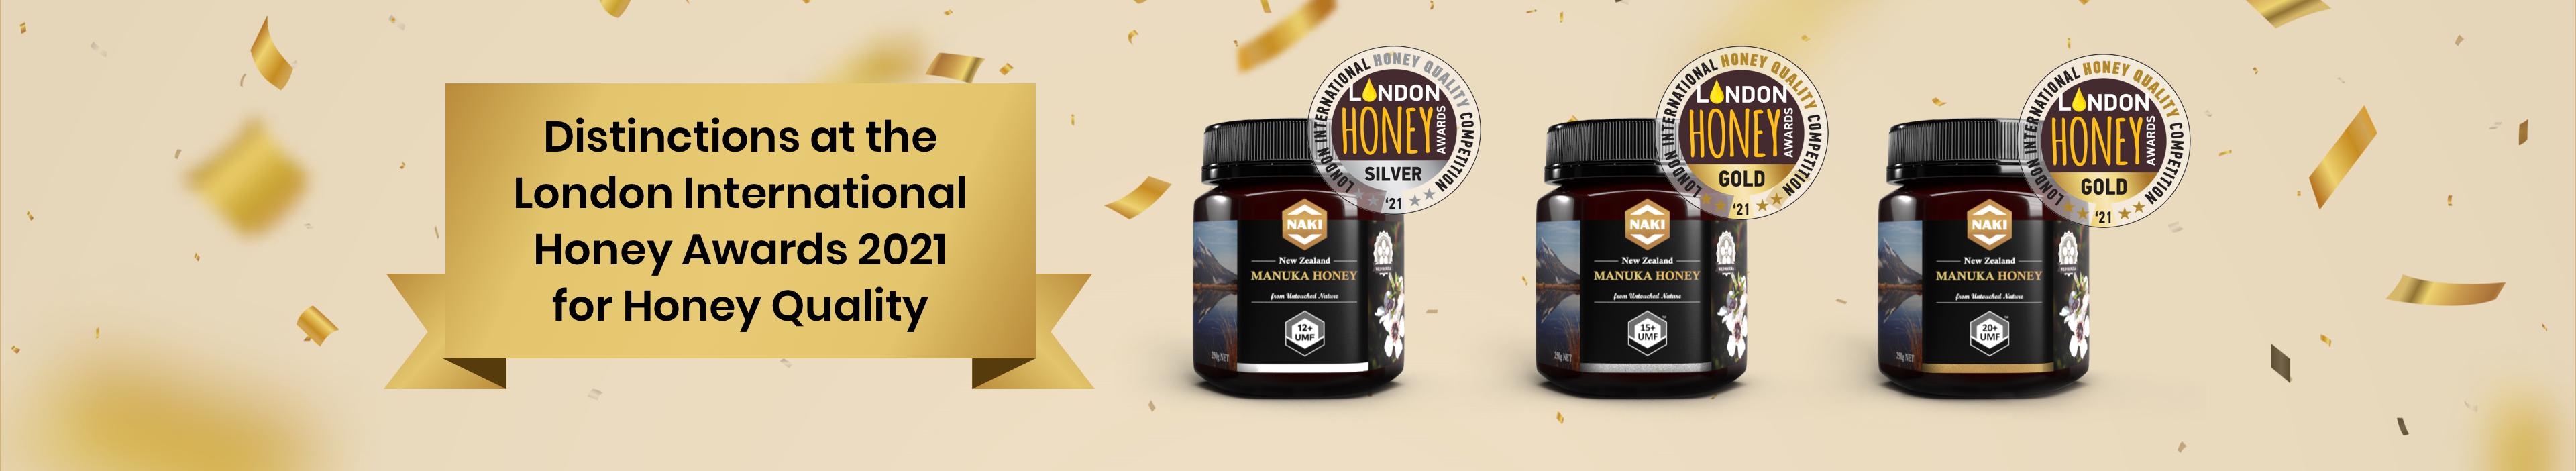 Distinctions at the london international honey awards 2021 for honey quality